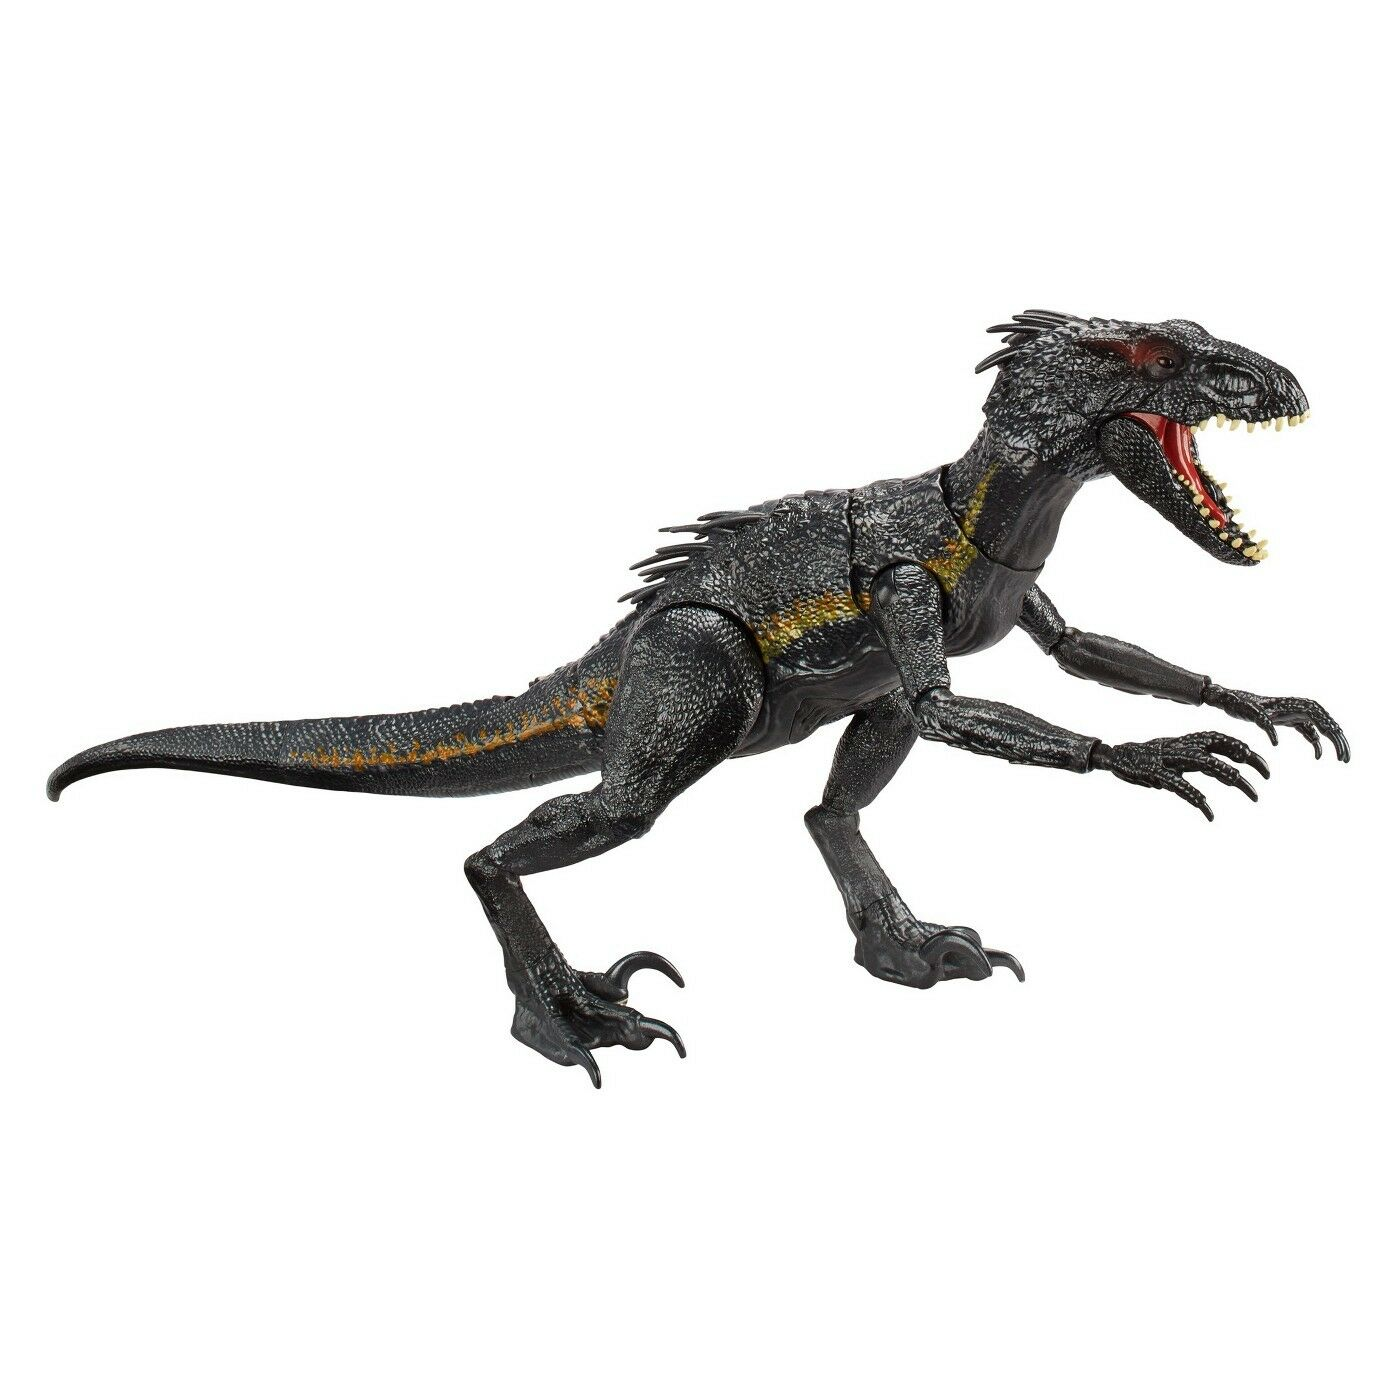 Jurassic World Fallen Kingdom Grab 'n Growl Indoraptor Dinosaur - NEW